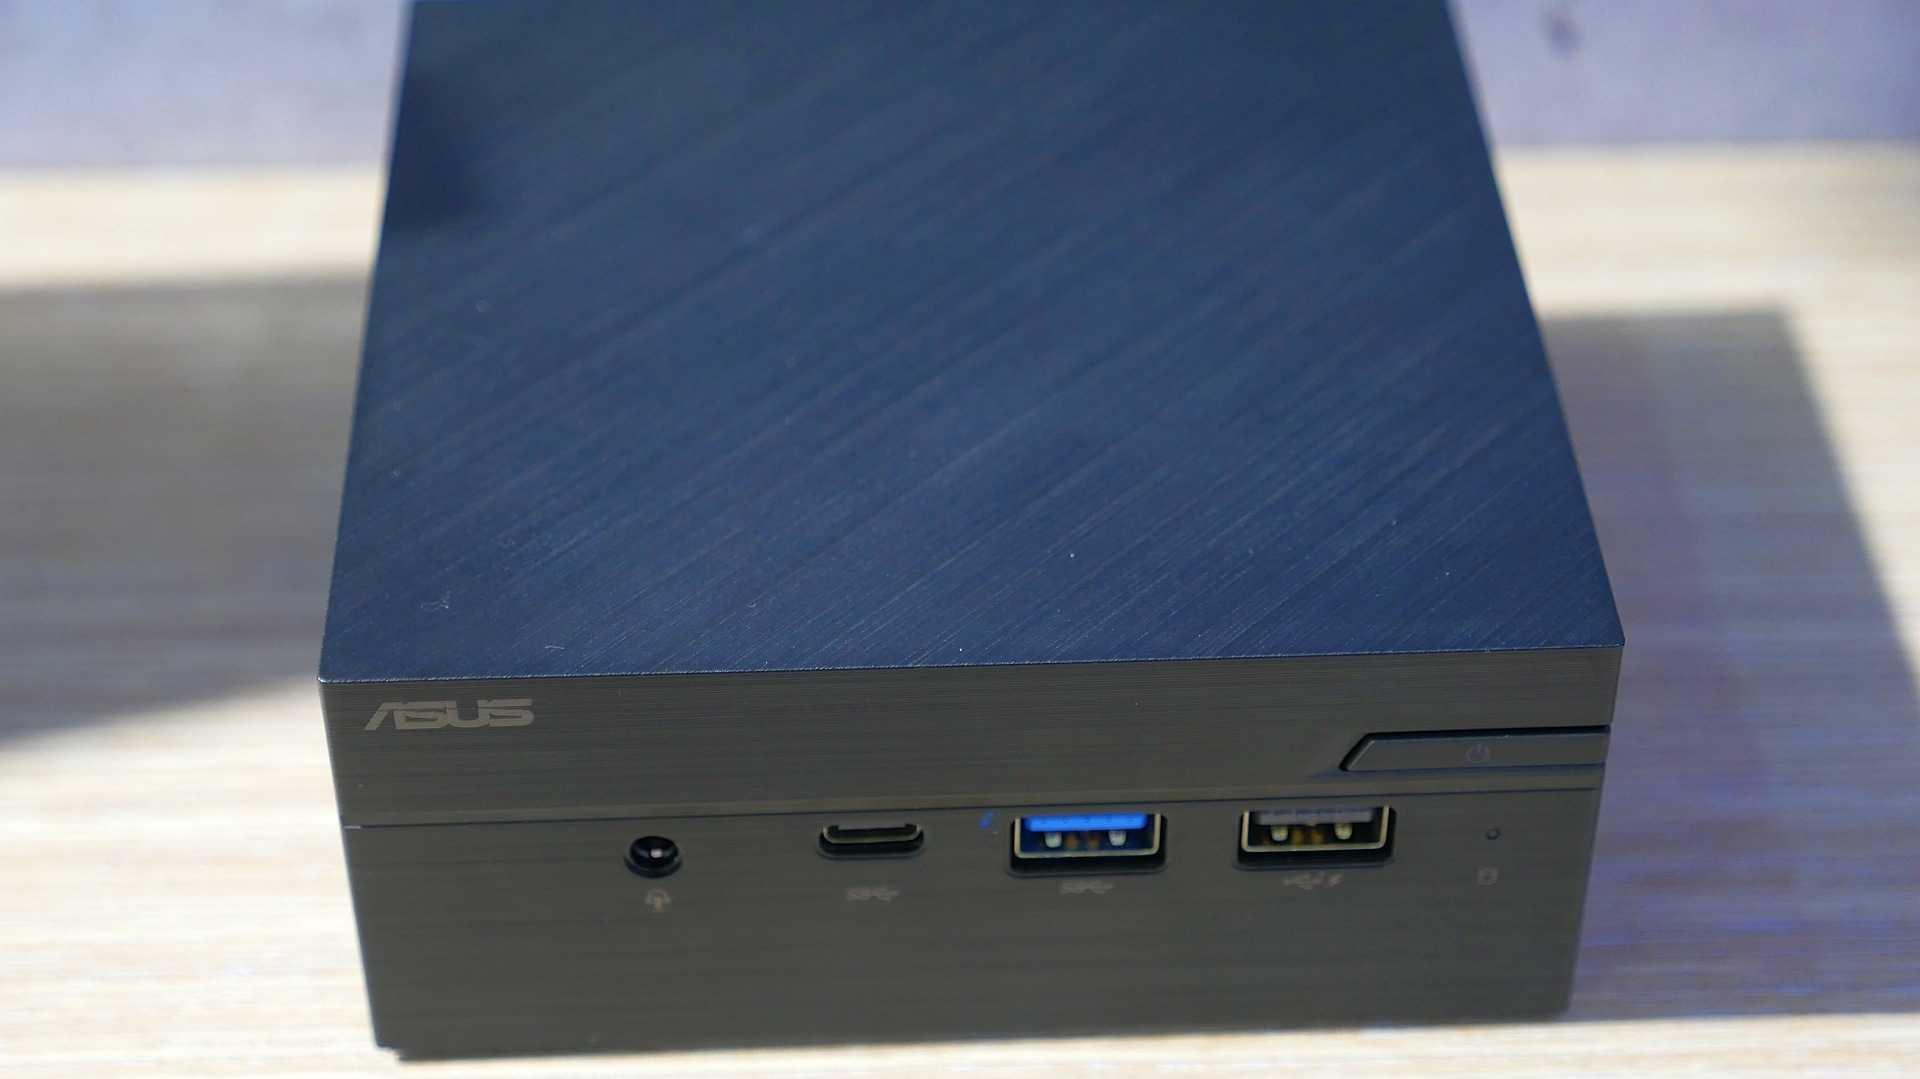 Asus' passiv gekühlter Mini-PC PN40 mit Intel Celeron N4000 Gemini Lake